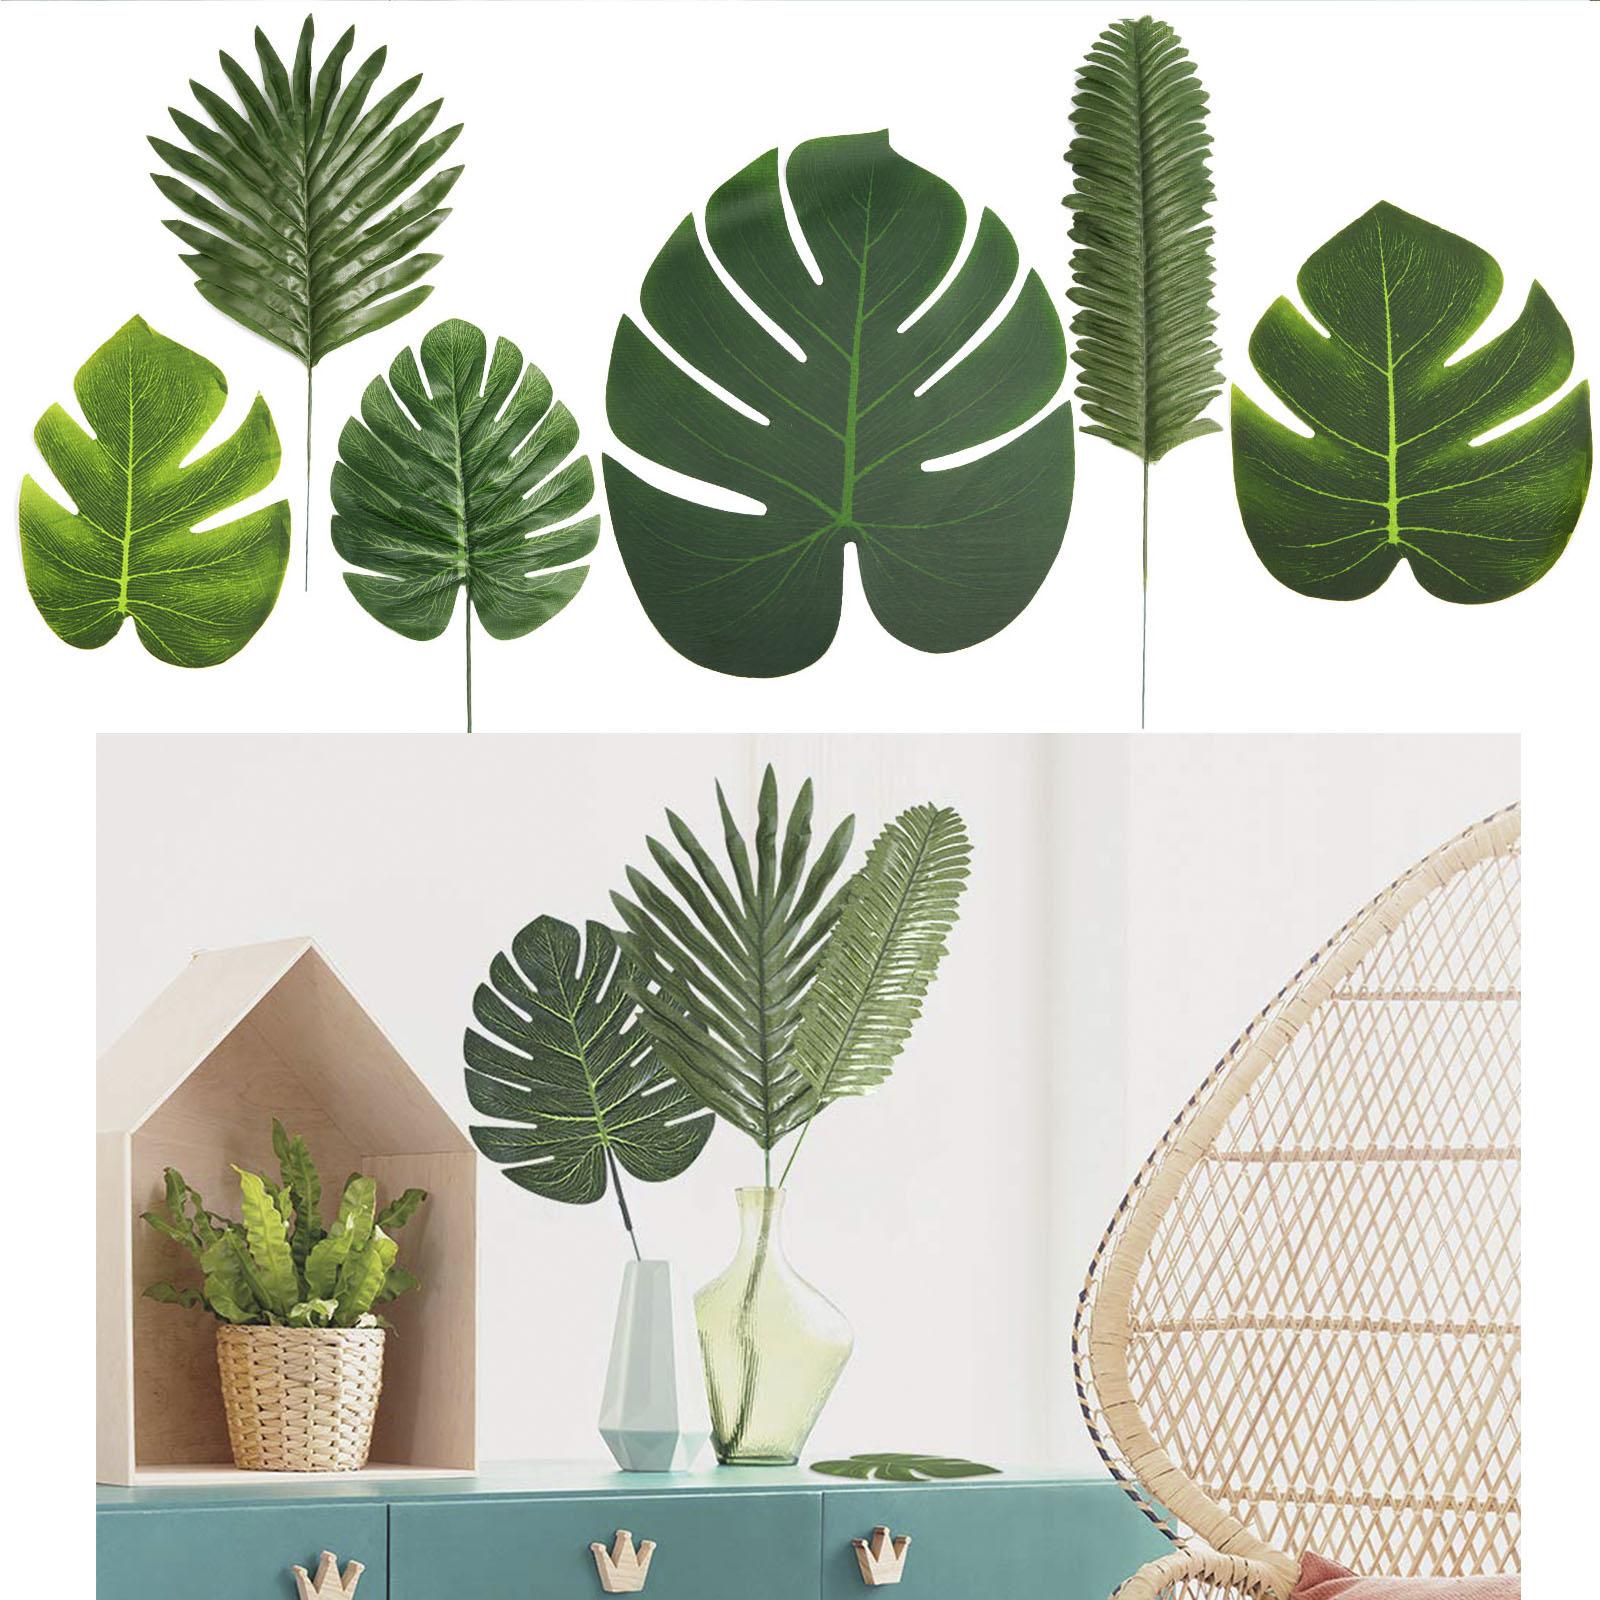 60 PCS 6 Kinds Tropical Hawaiian Artificial Palm Leaves Foliage Party Decor